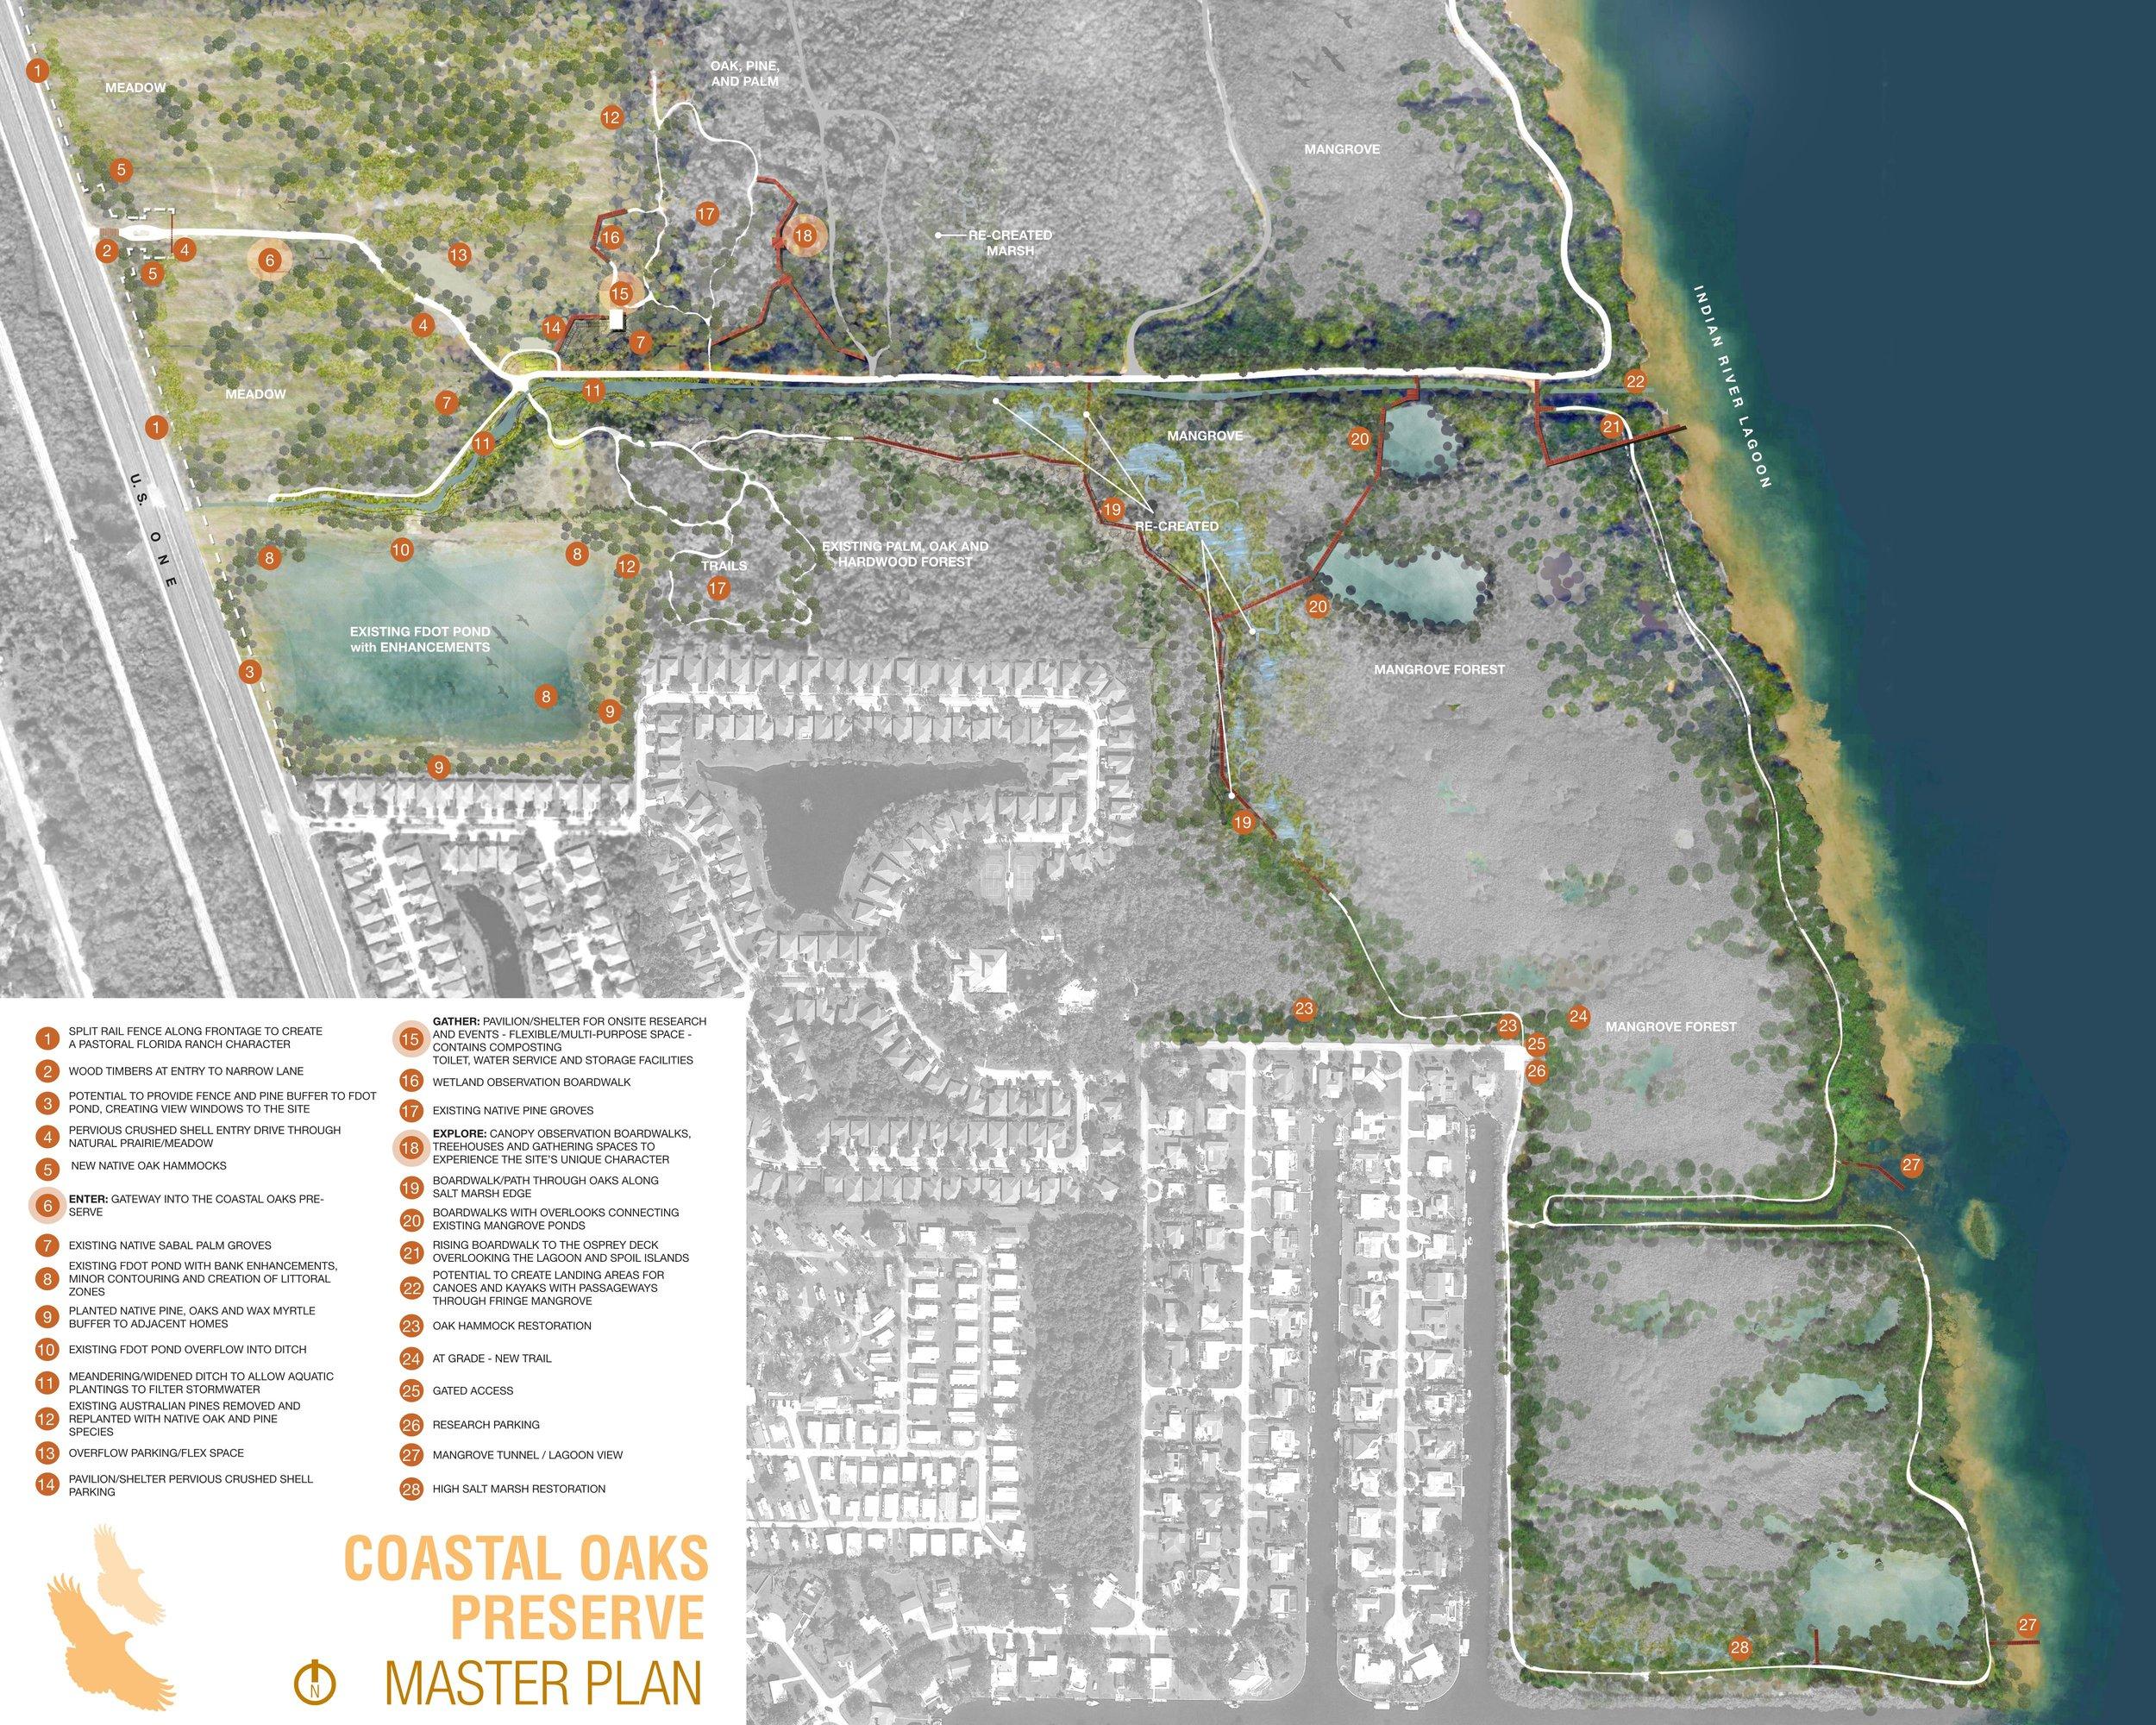 Coastal Oaks Master Plan.jpg